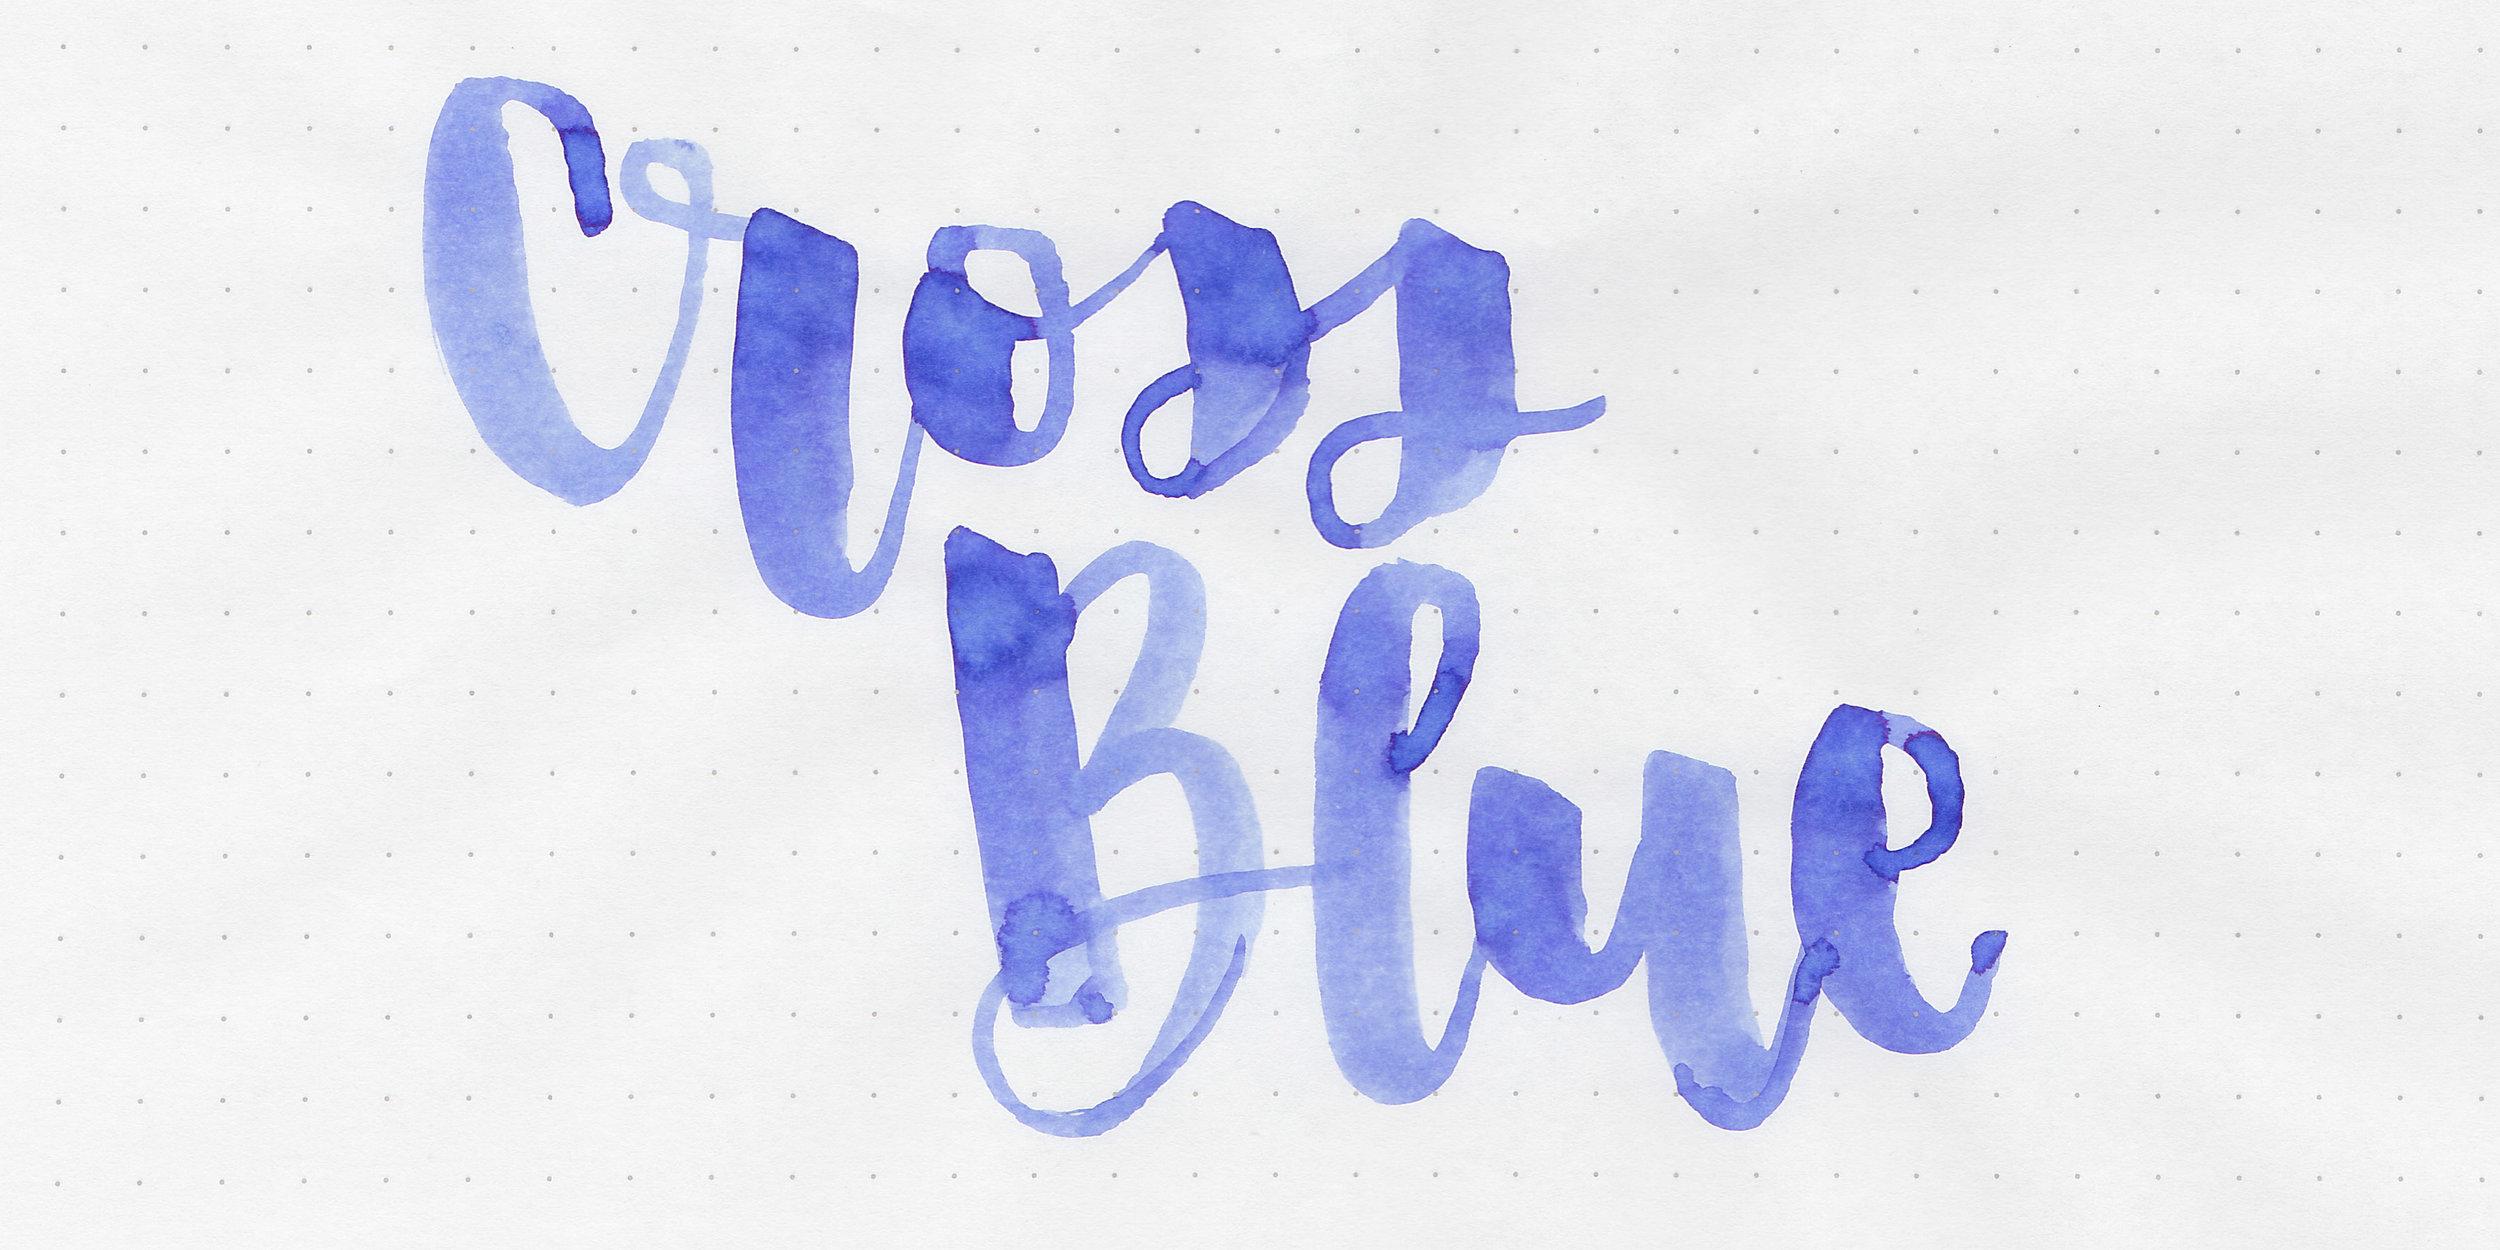 css-blue-2.jpg